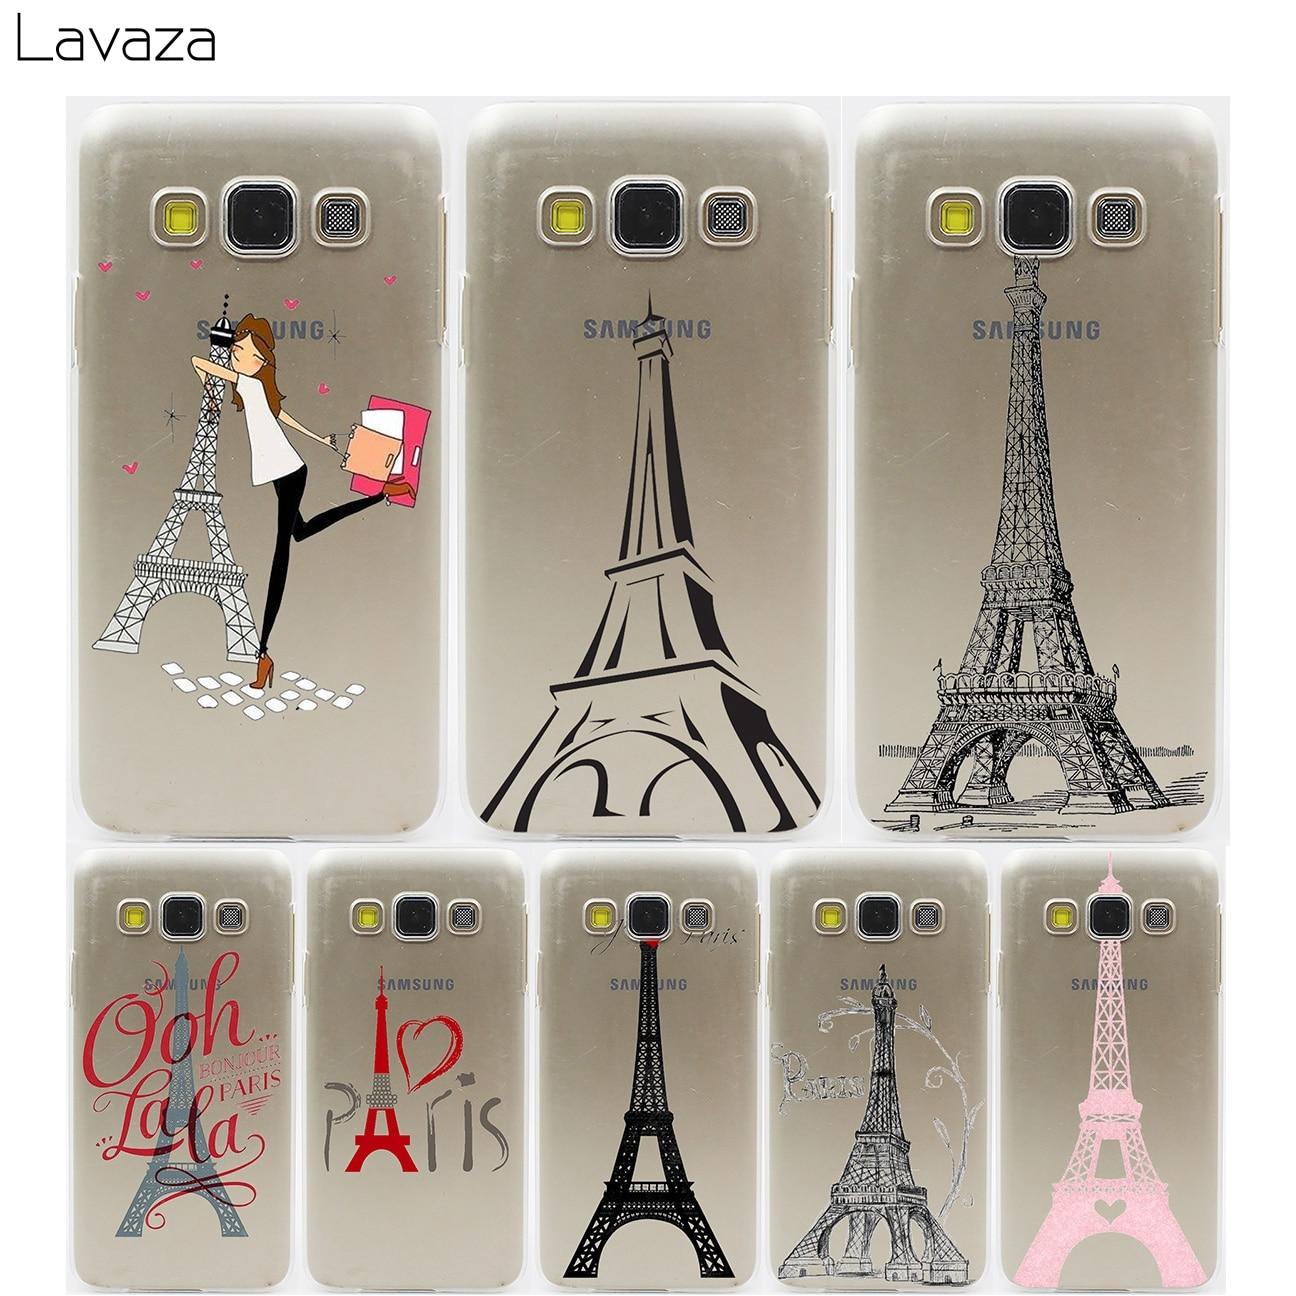 Lavaza The Eiffel Tower Case For Samsung Galaxy A3 A5 A7 A8 2018 Love Mei Powerful Bumper Xiaomi Mi Note 2 Original 100 2017 2016 2015 Plus 3 4 5 8 Grand Prime